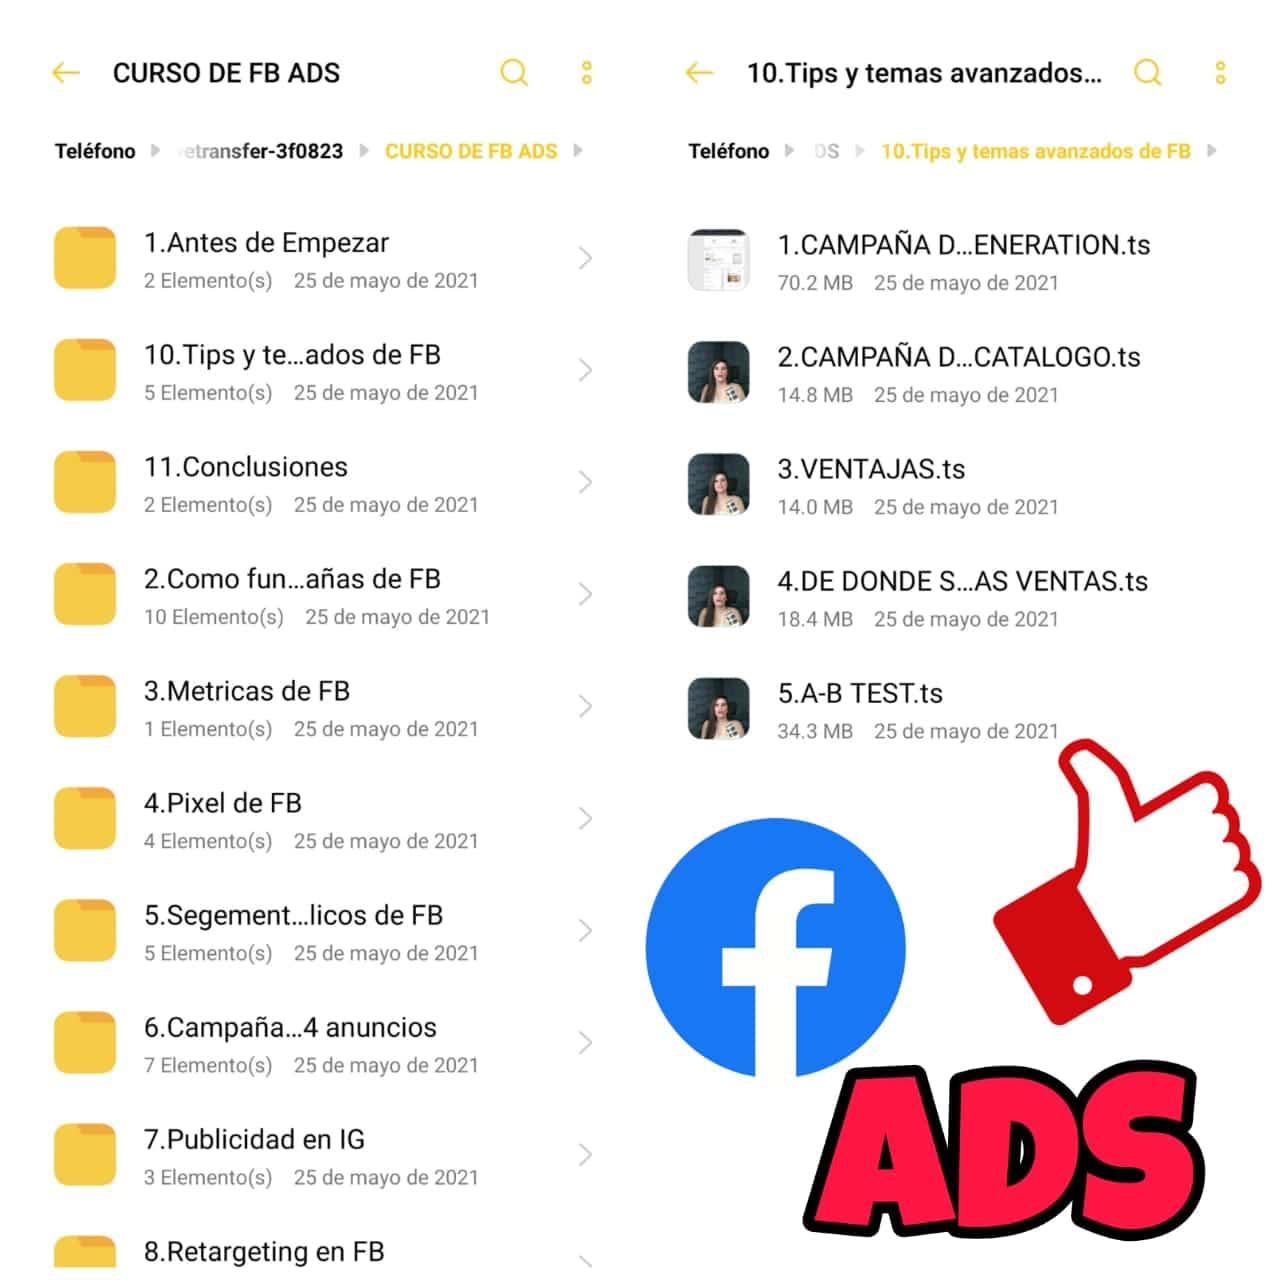 Descargar CURSO De FACEBOOK ADS Gratis  Facebook ADS DE CERO A PRO 2021